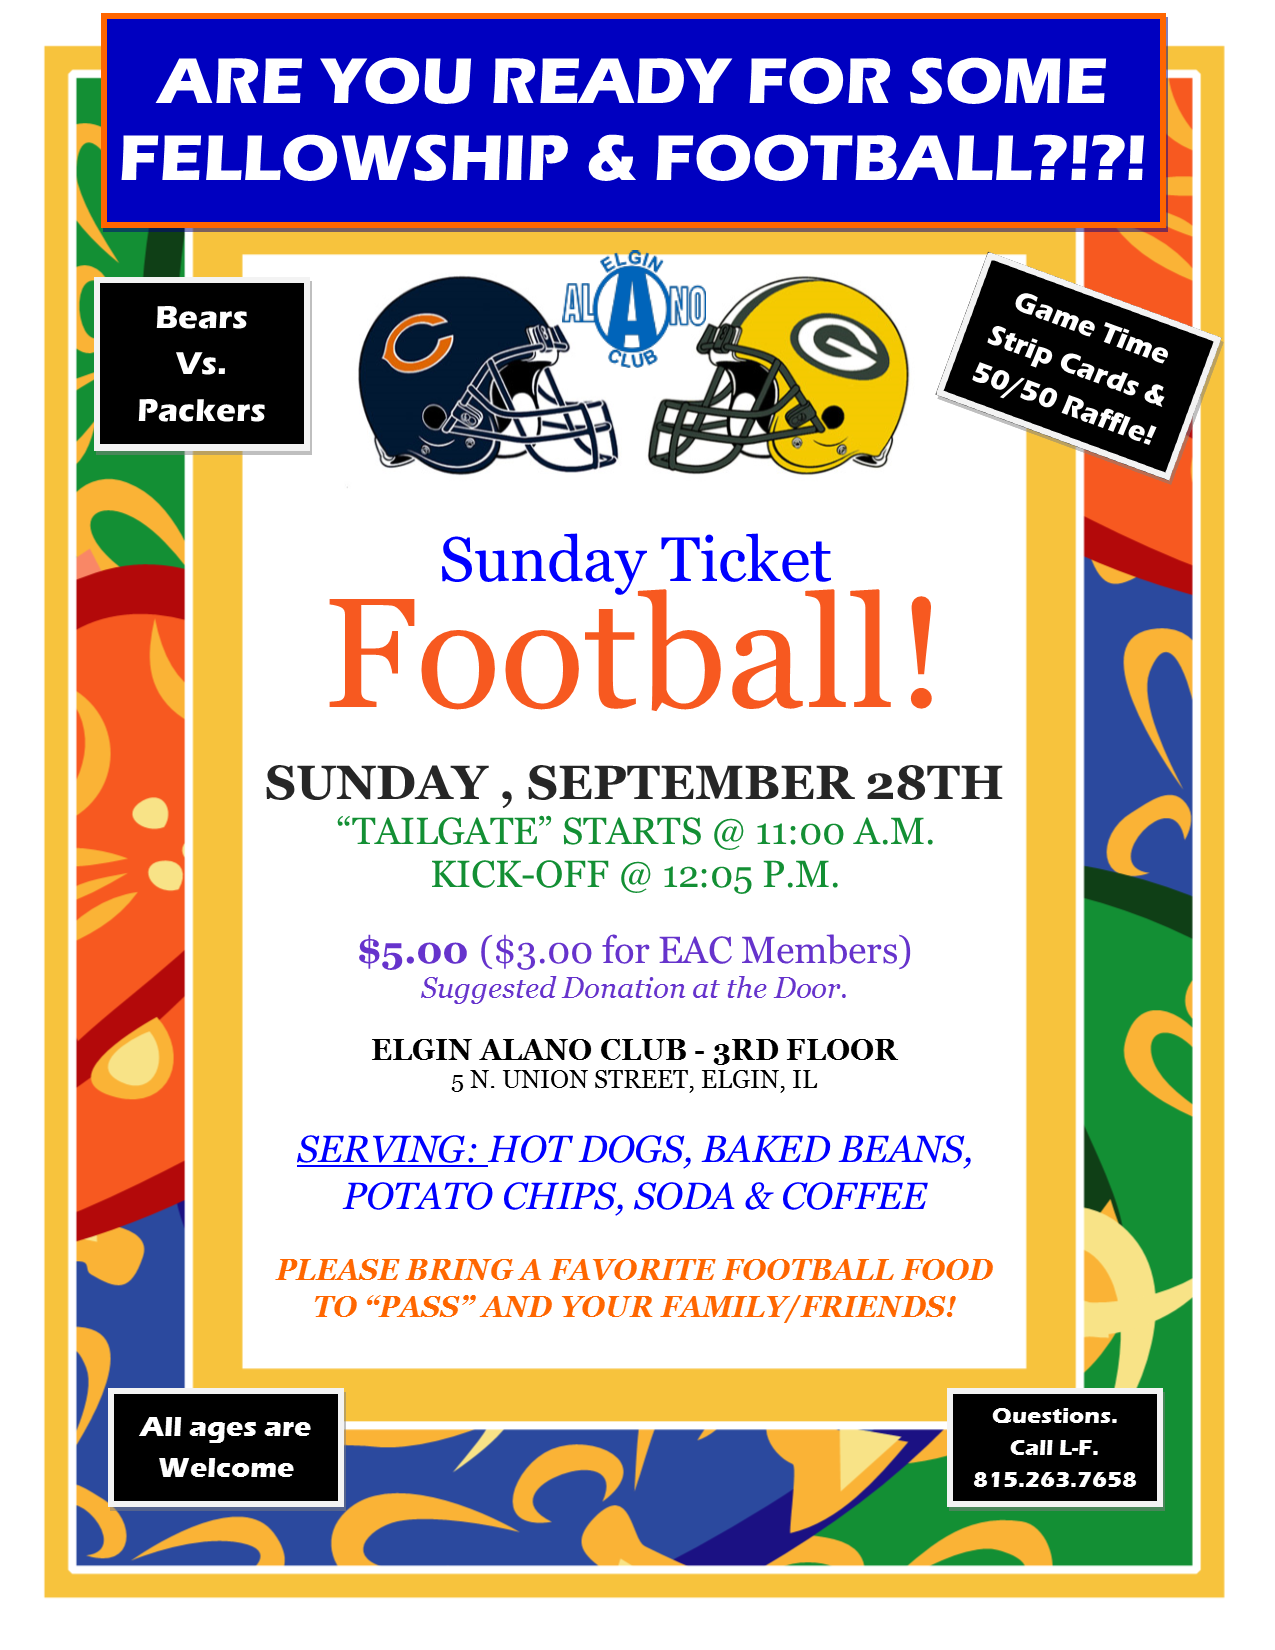 Bears Vs. Packers Sunday Football, Food & Fellowship 3